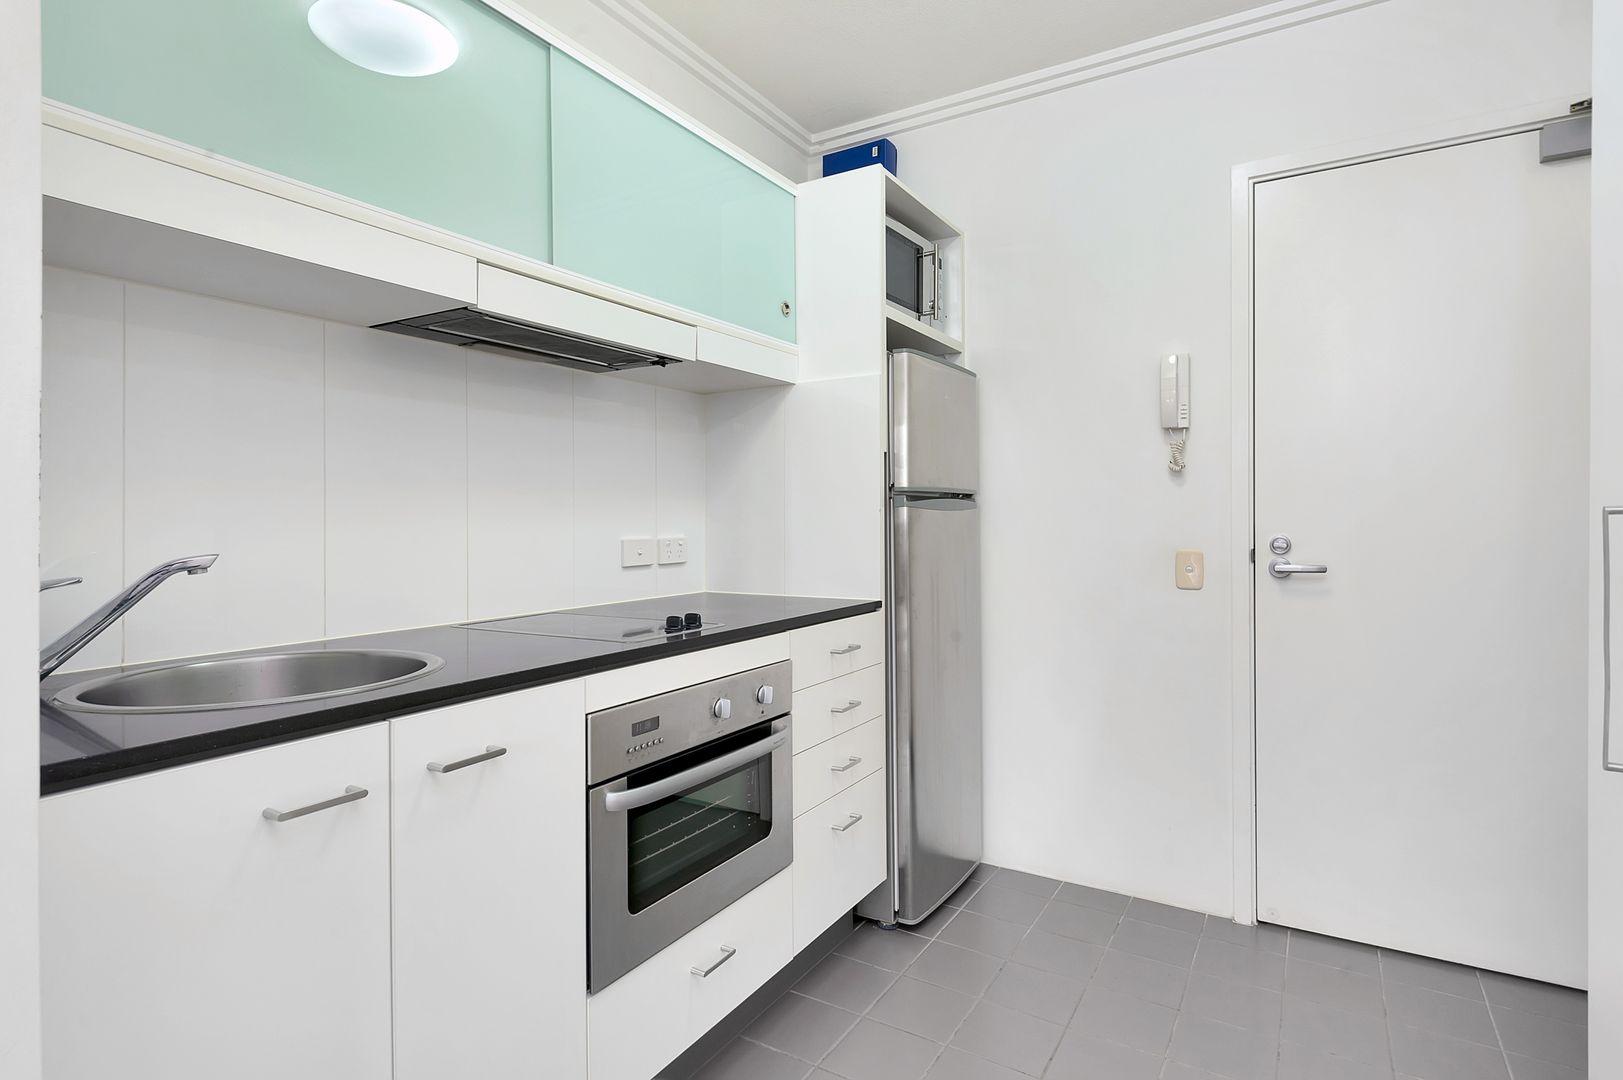 18/62 Cordelia Street, South Brisbane QLD 4101, Image 2